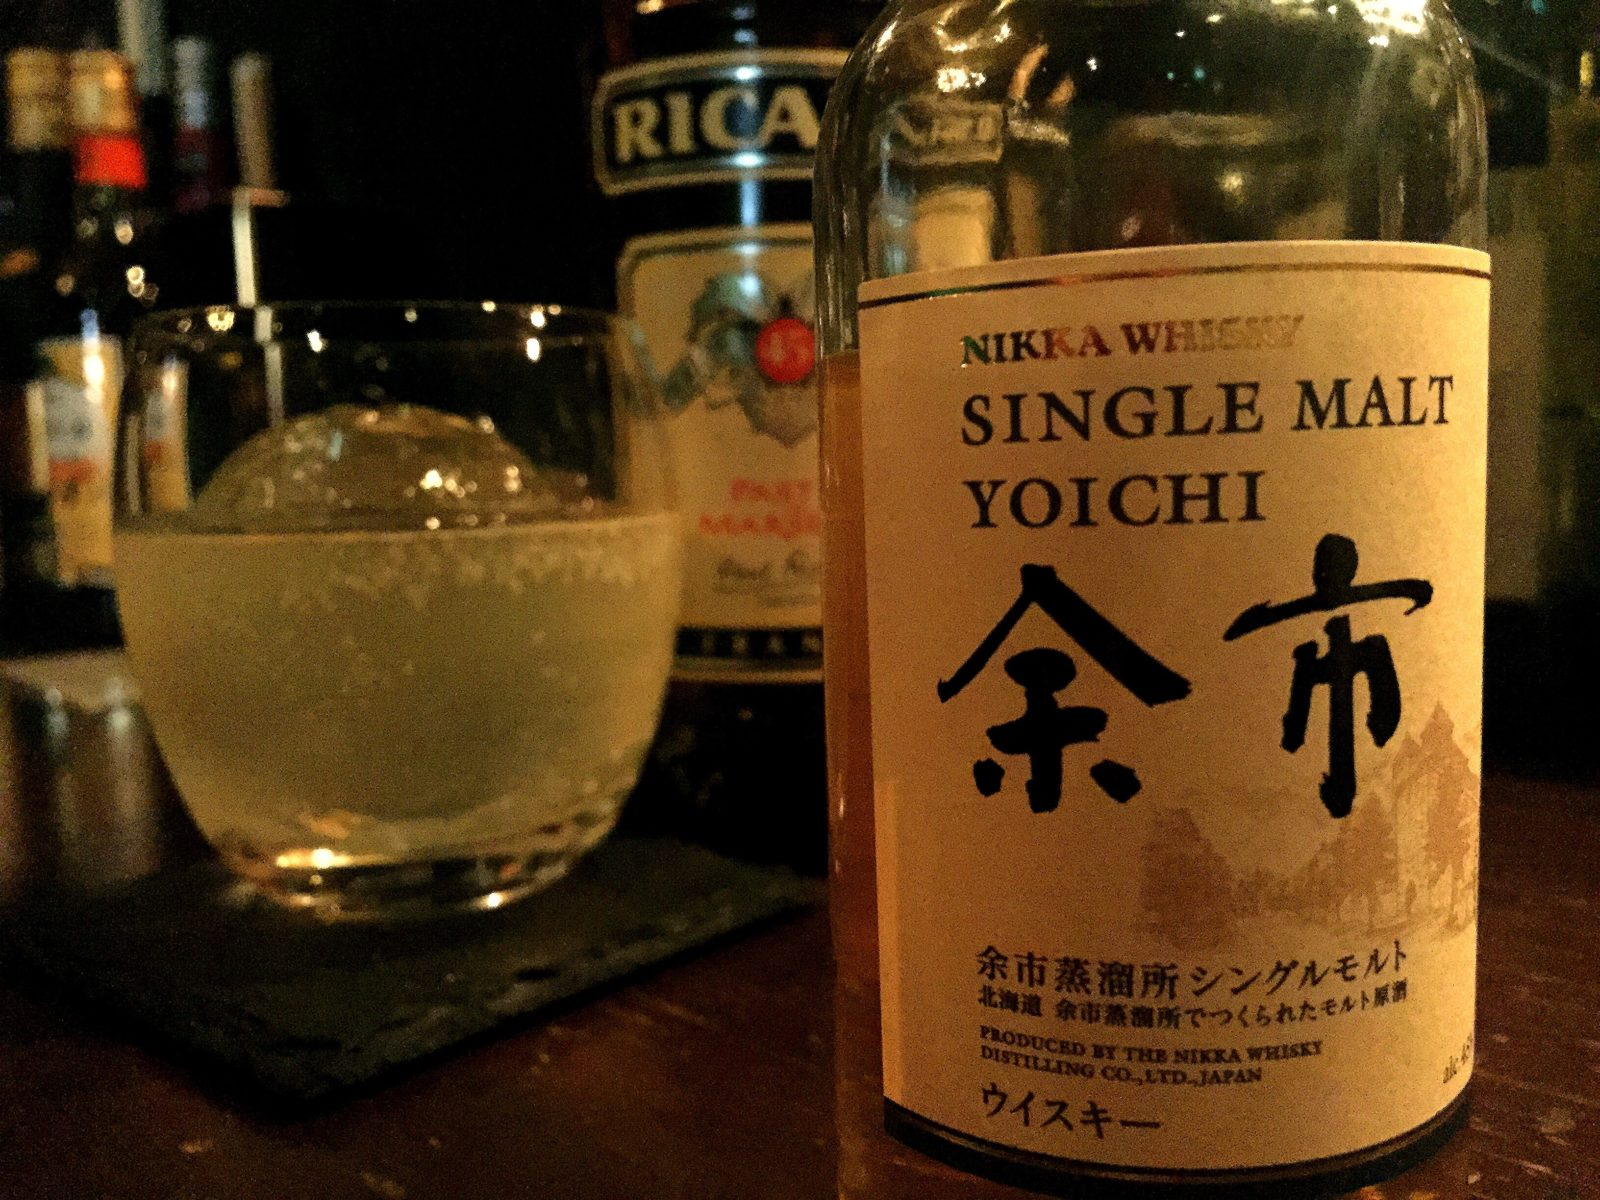 bartender's choice the Yoichi whisky